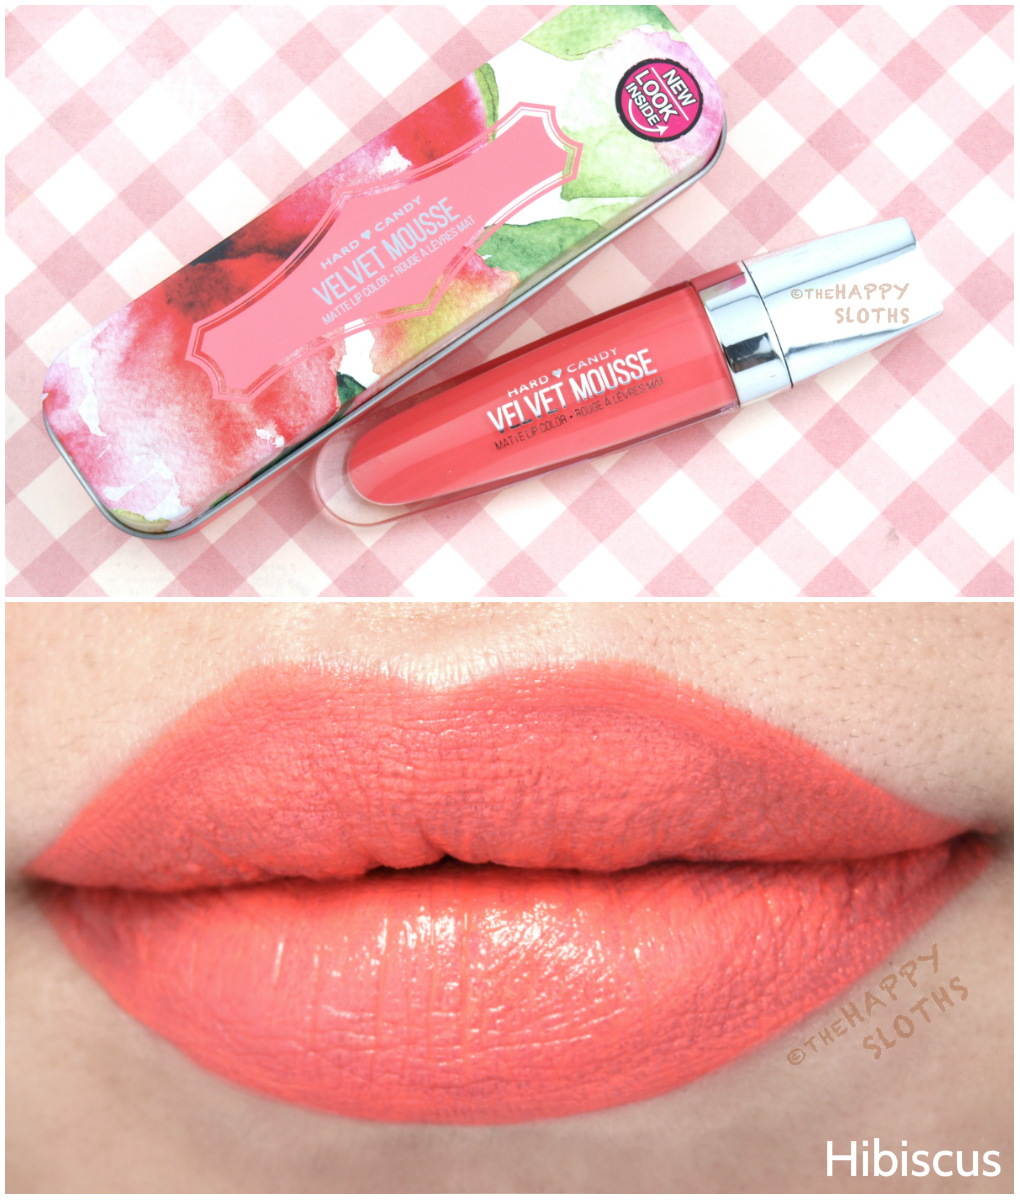 03 Cherry Bomb Emina Sugar Rush Lipstick 38gr Daftar Harga Terbaru Cookie Dough 02 Hard Candy Velvet Mousse Matte Lip Color In Blossom